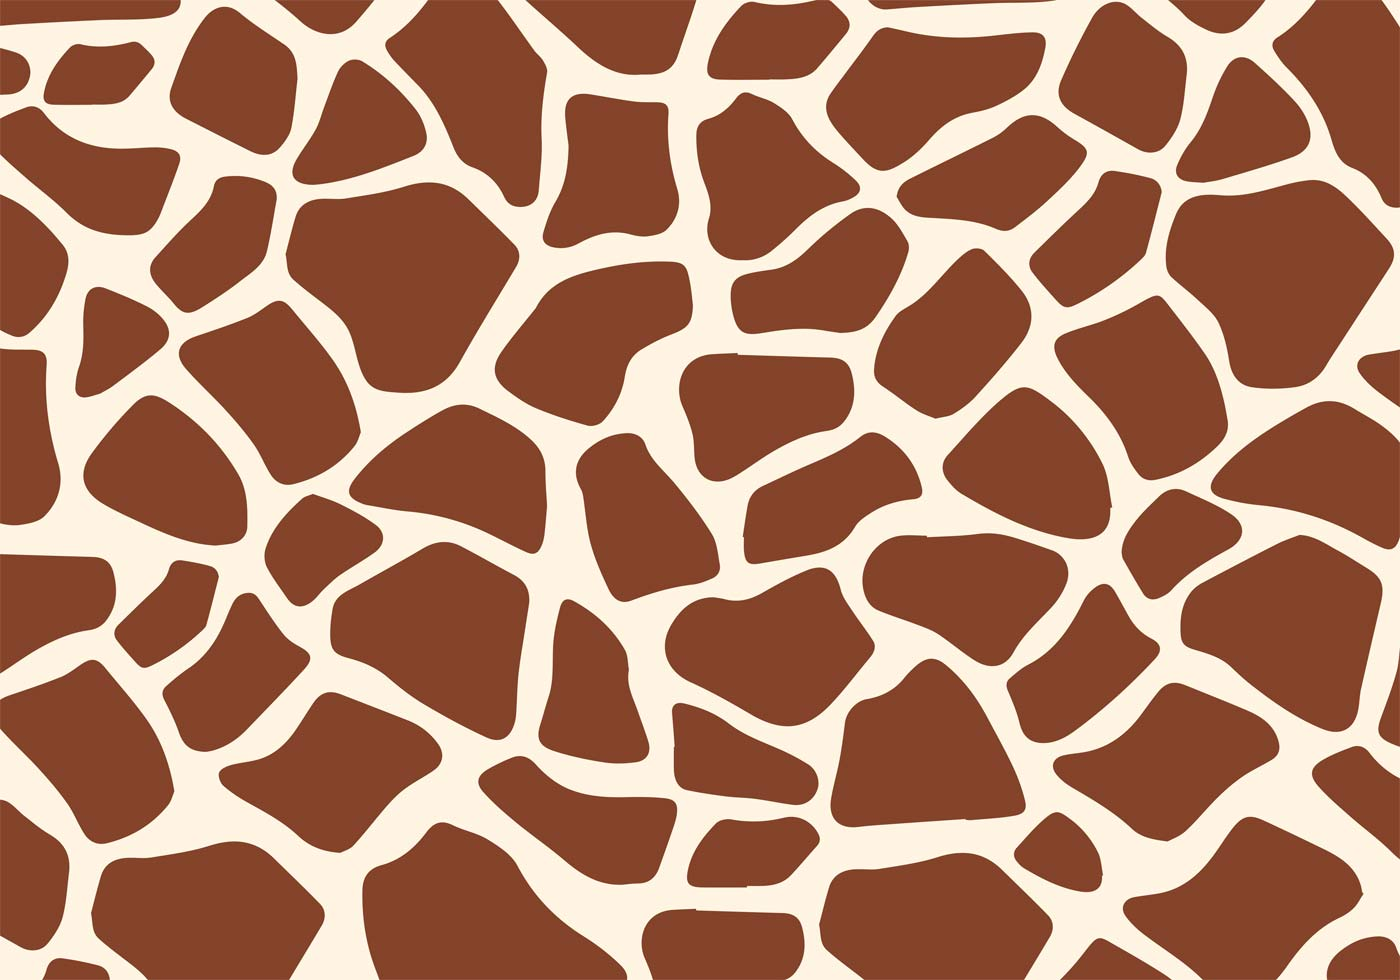 1400x980 Giraffe Print Free Vector Art